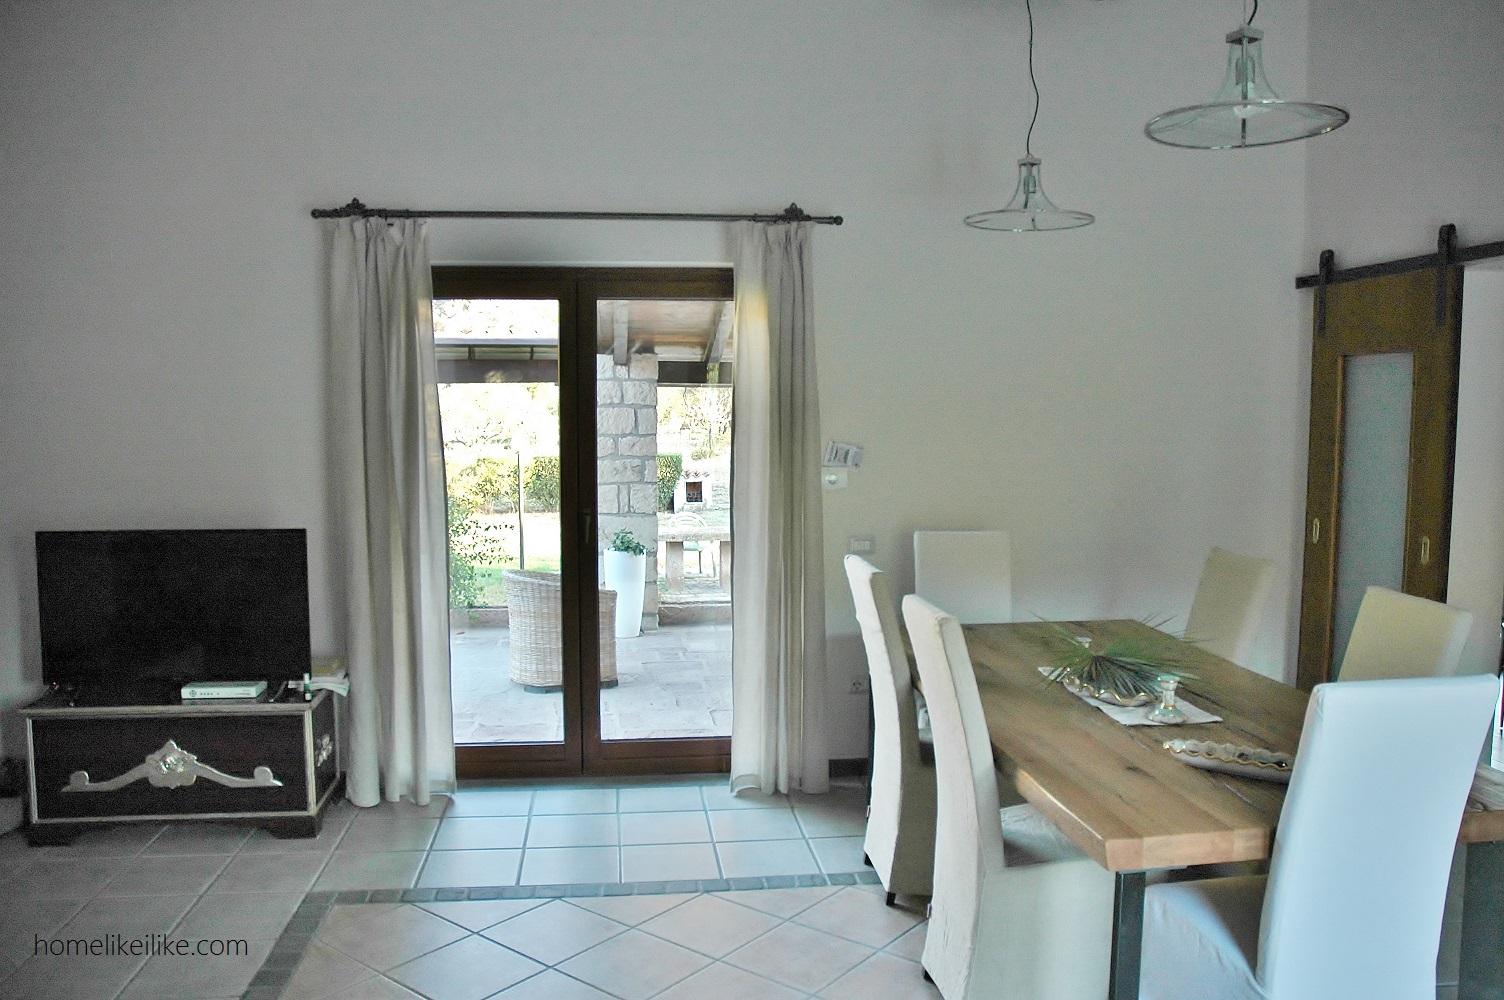 Mediterranean interior - homelikeilike.com